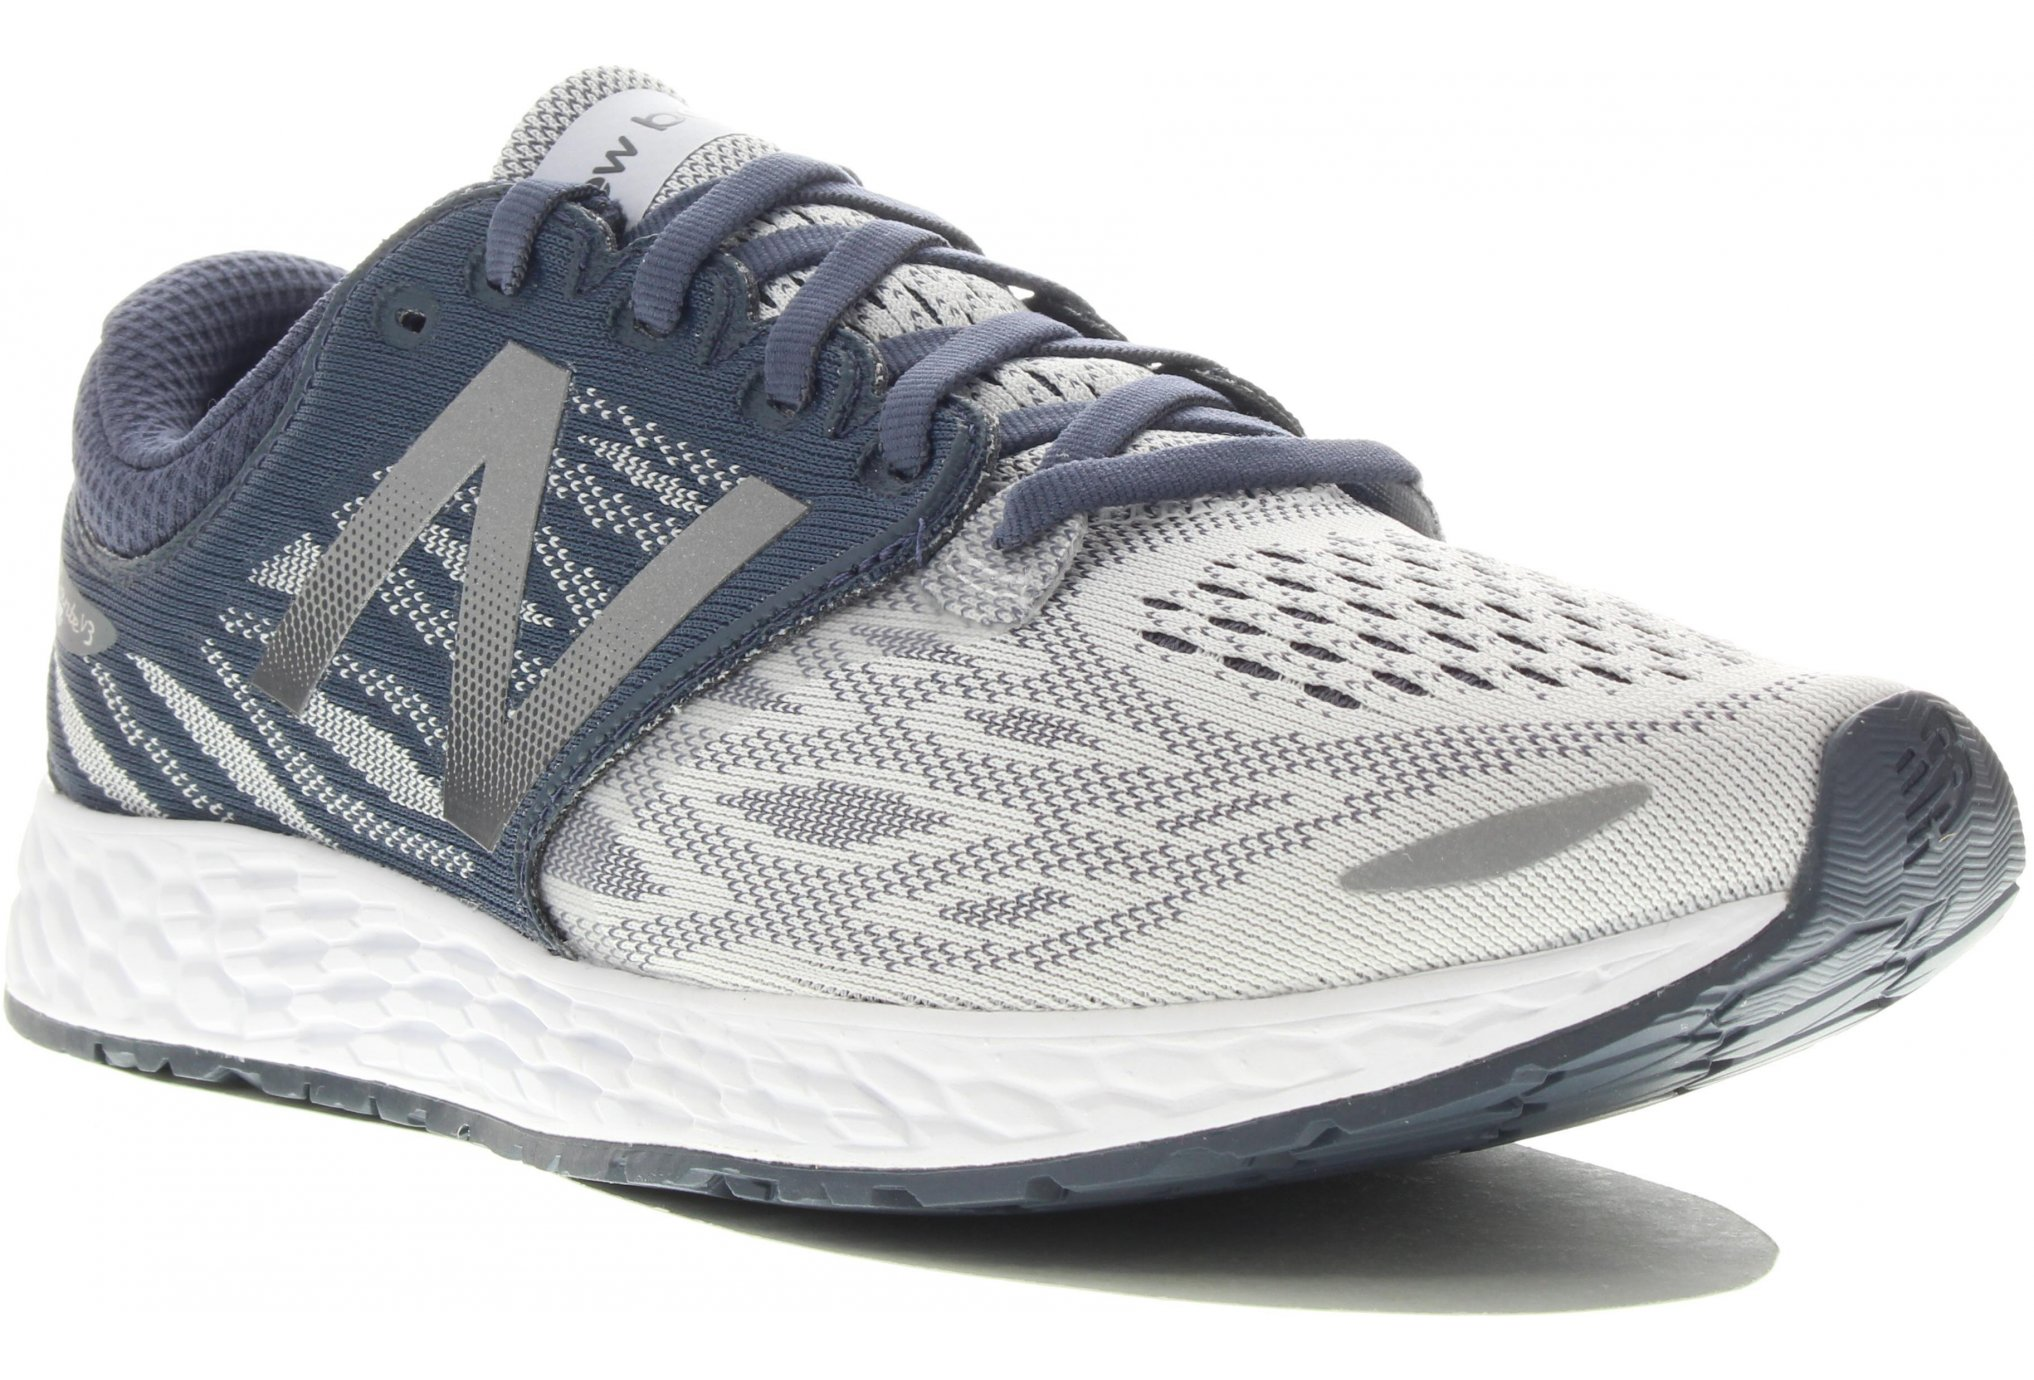 chaussures de sport 3009e 38410 Course Nature LA LUPEENNE - New Balance Fresh Foam ZANTE V3 ...